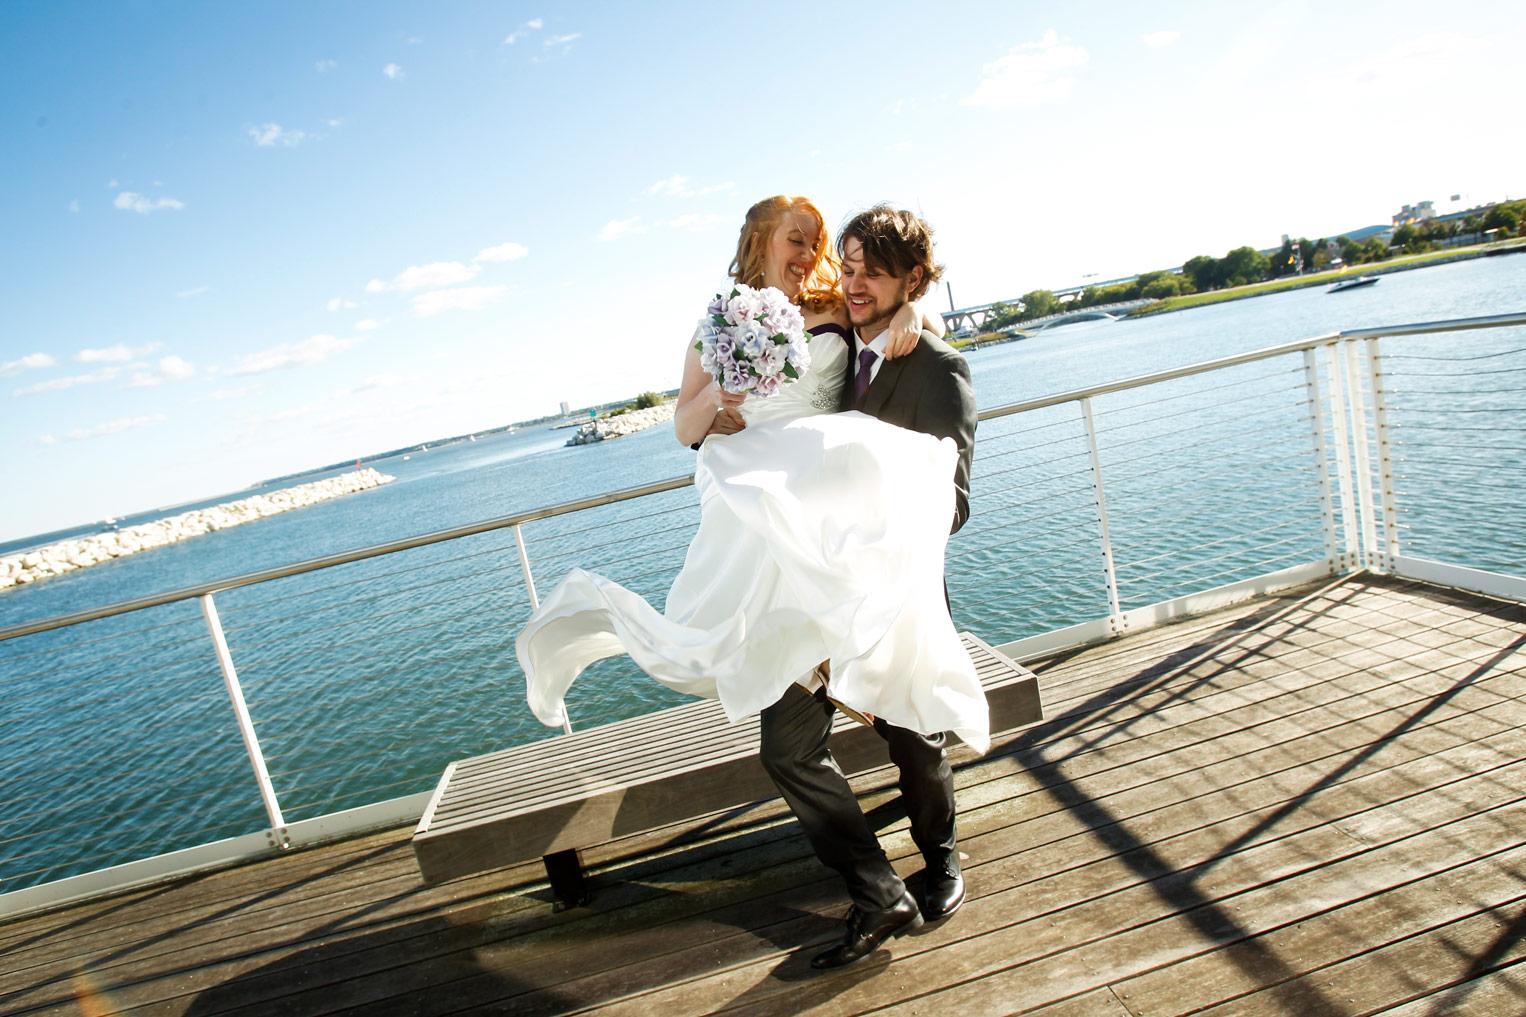 milwaukee-discovery-world-pier-wisconsin-wedding-ruthie-hauge-photography-21.jpg